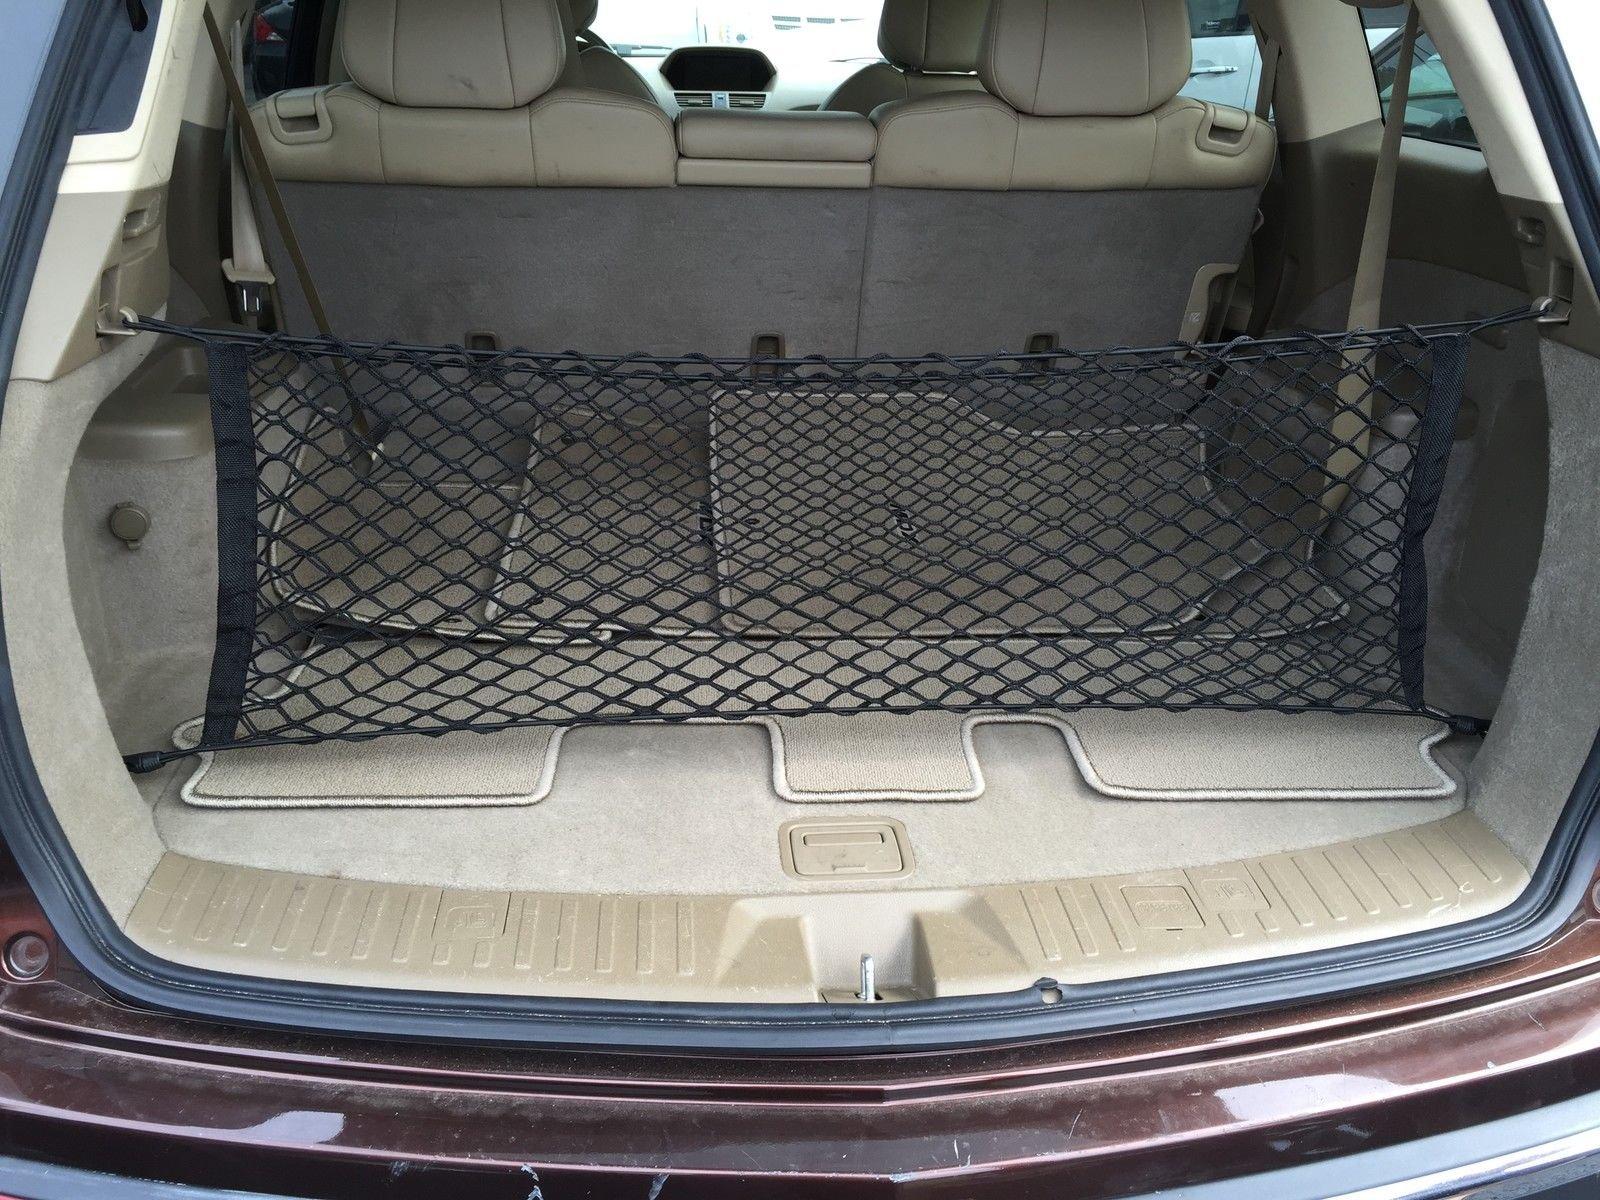 Envelope Style Trunk Cargo Net for Acura MDX 2007 - 2013 NEW